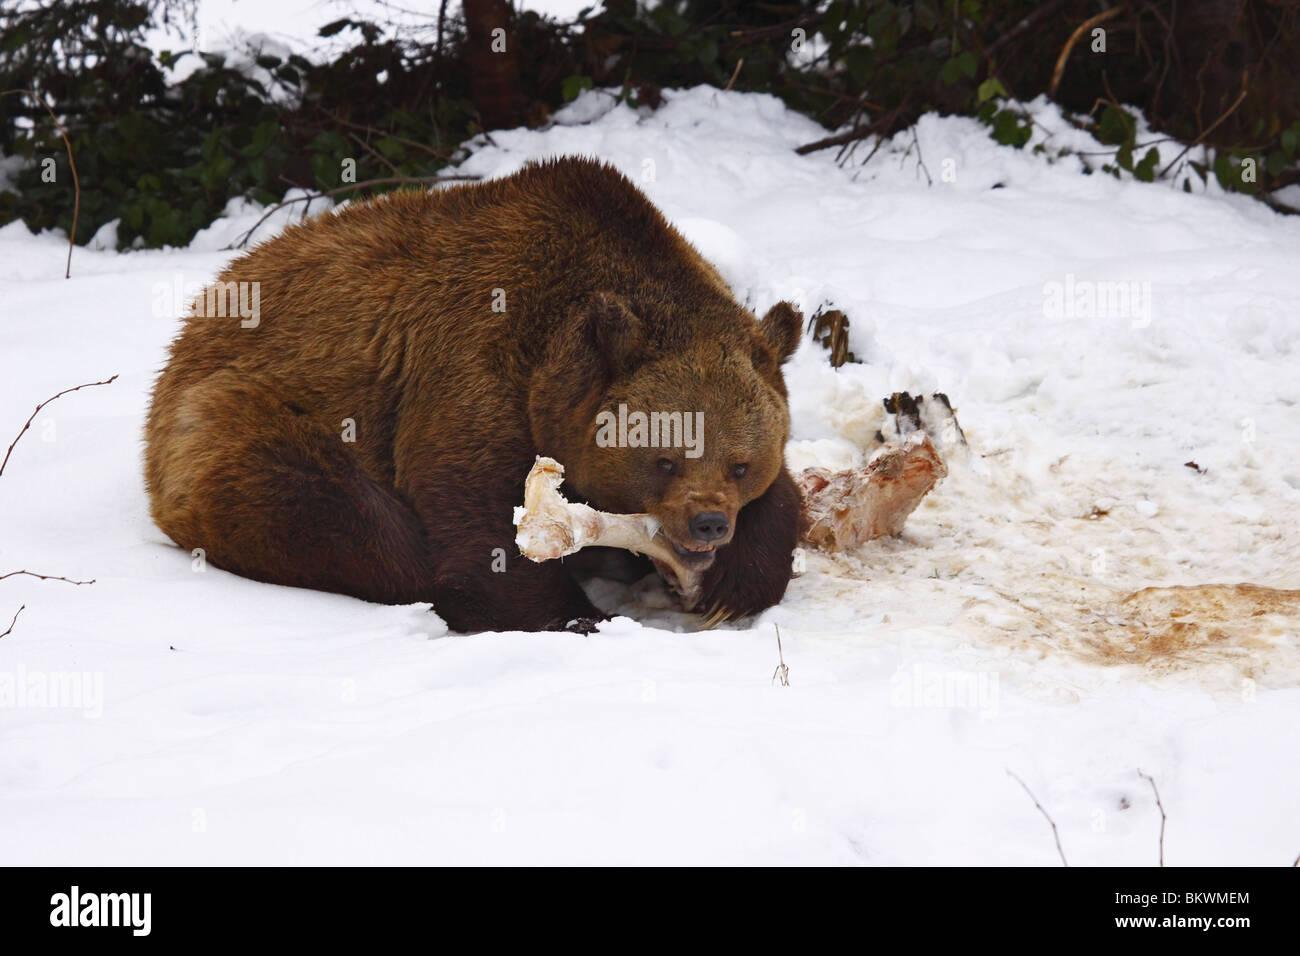 brown bear ursus arctos Braunbär - Stock Image